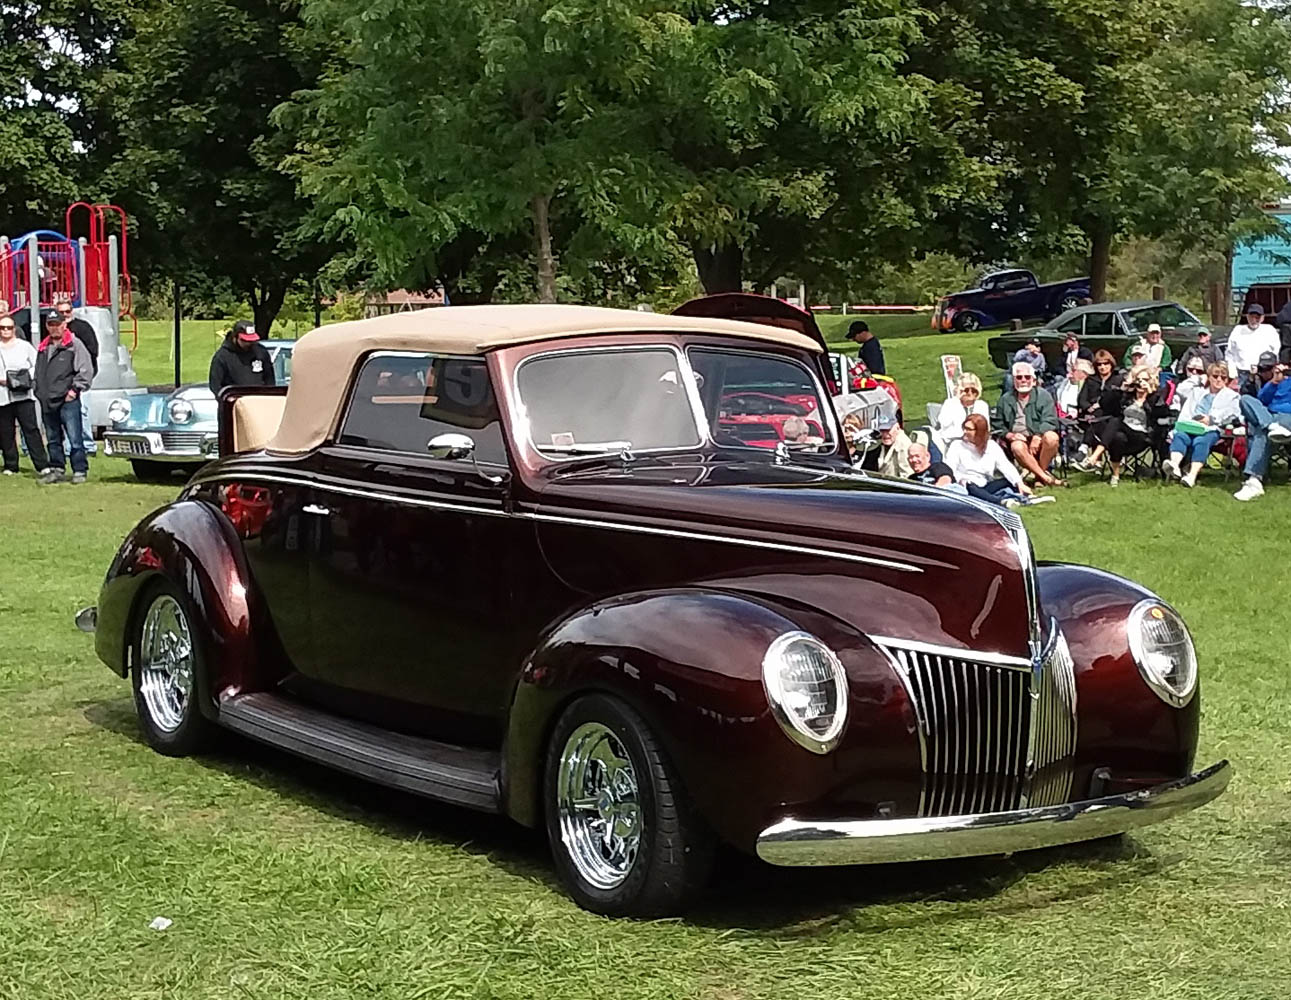 Top 25- 1939 Ford Convertible, Gary Marsh 1